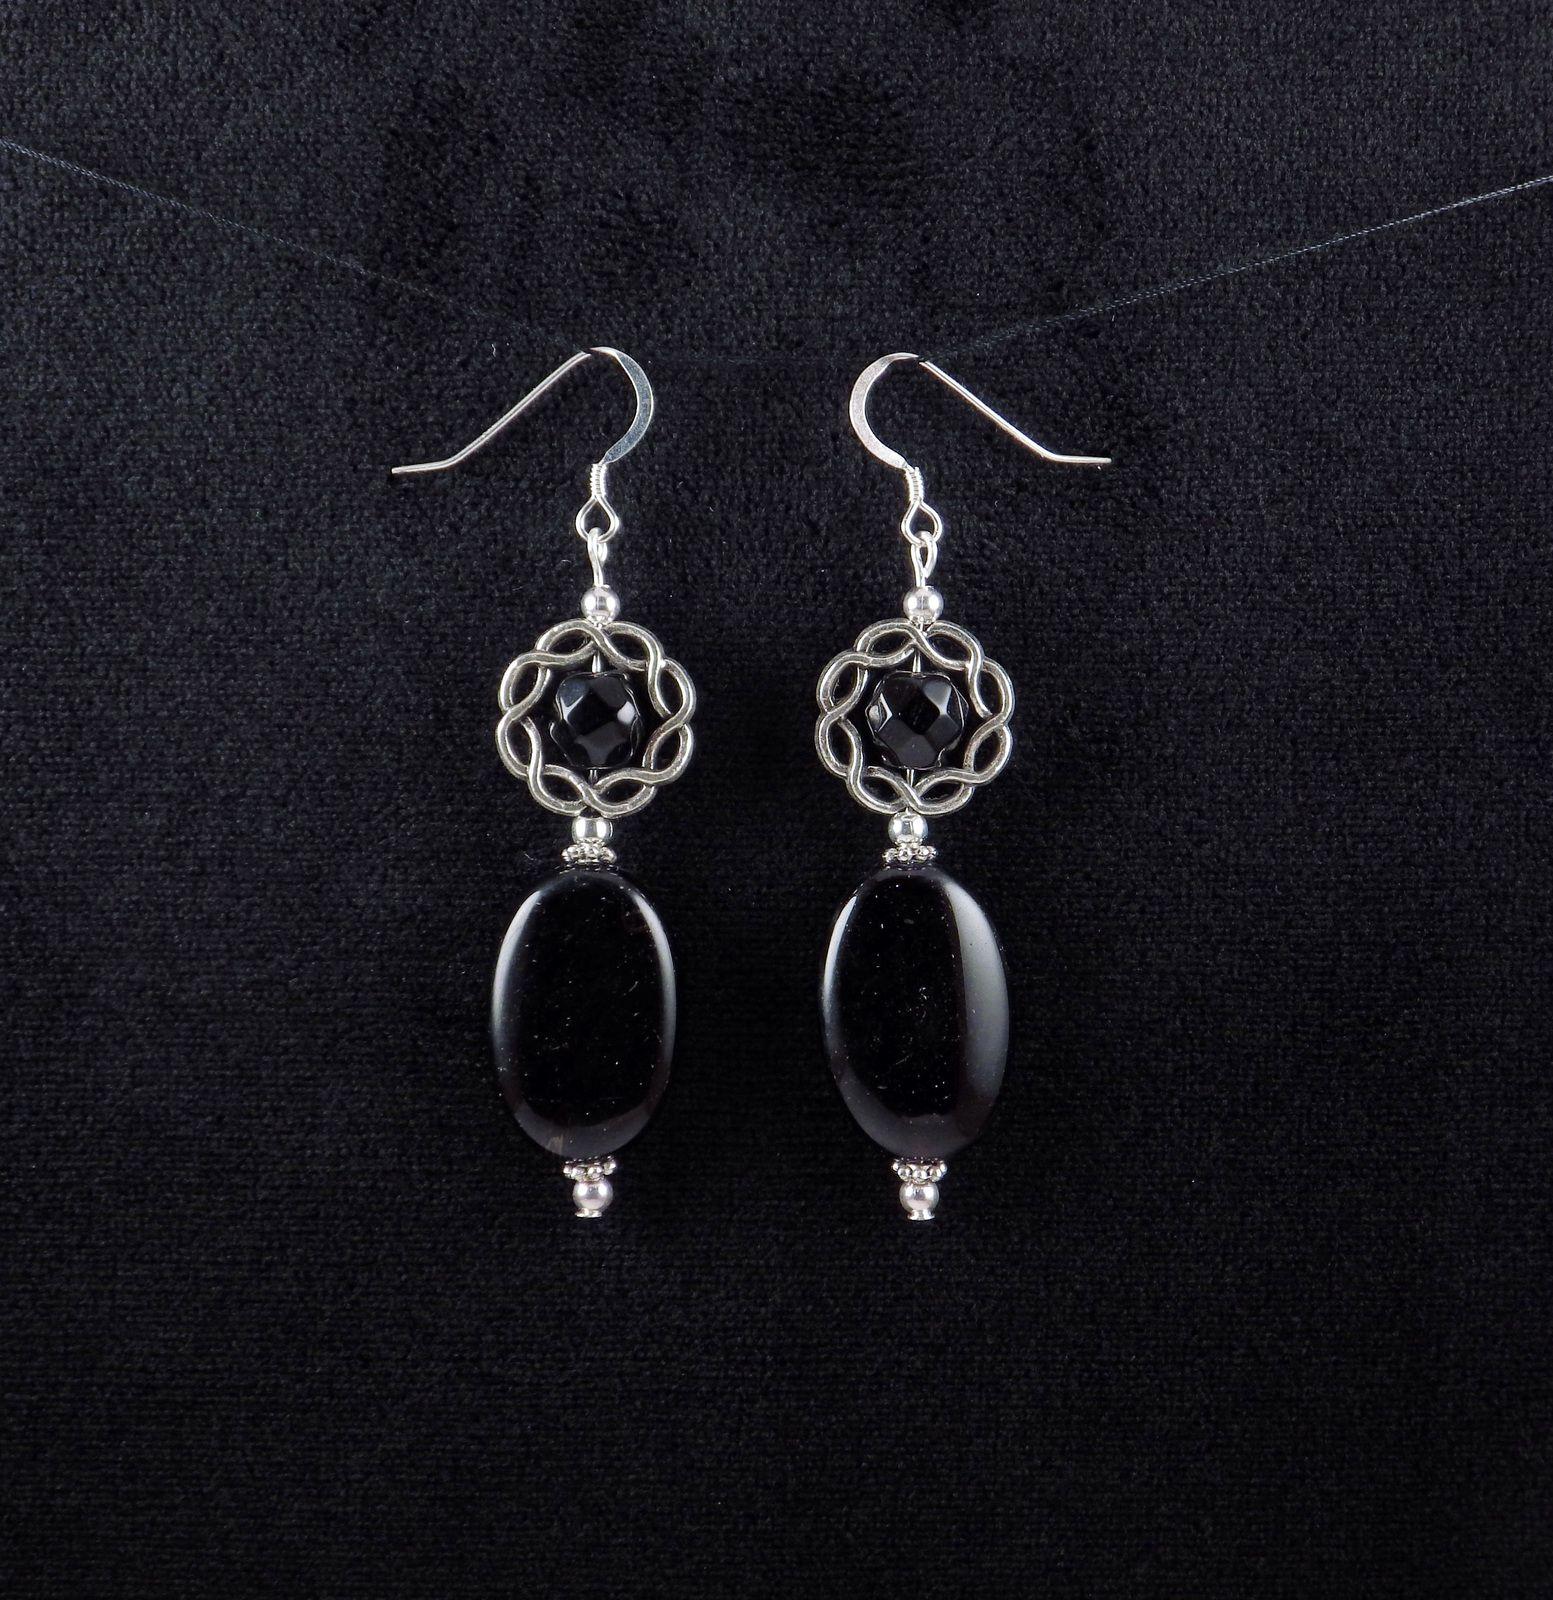 Handcrafted Black Glass Bead Silver Dangle Drop Earrings